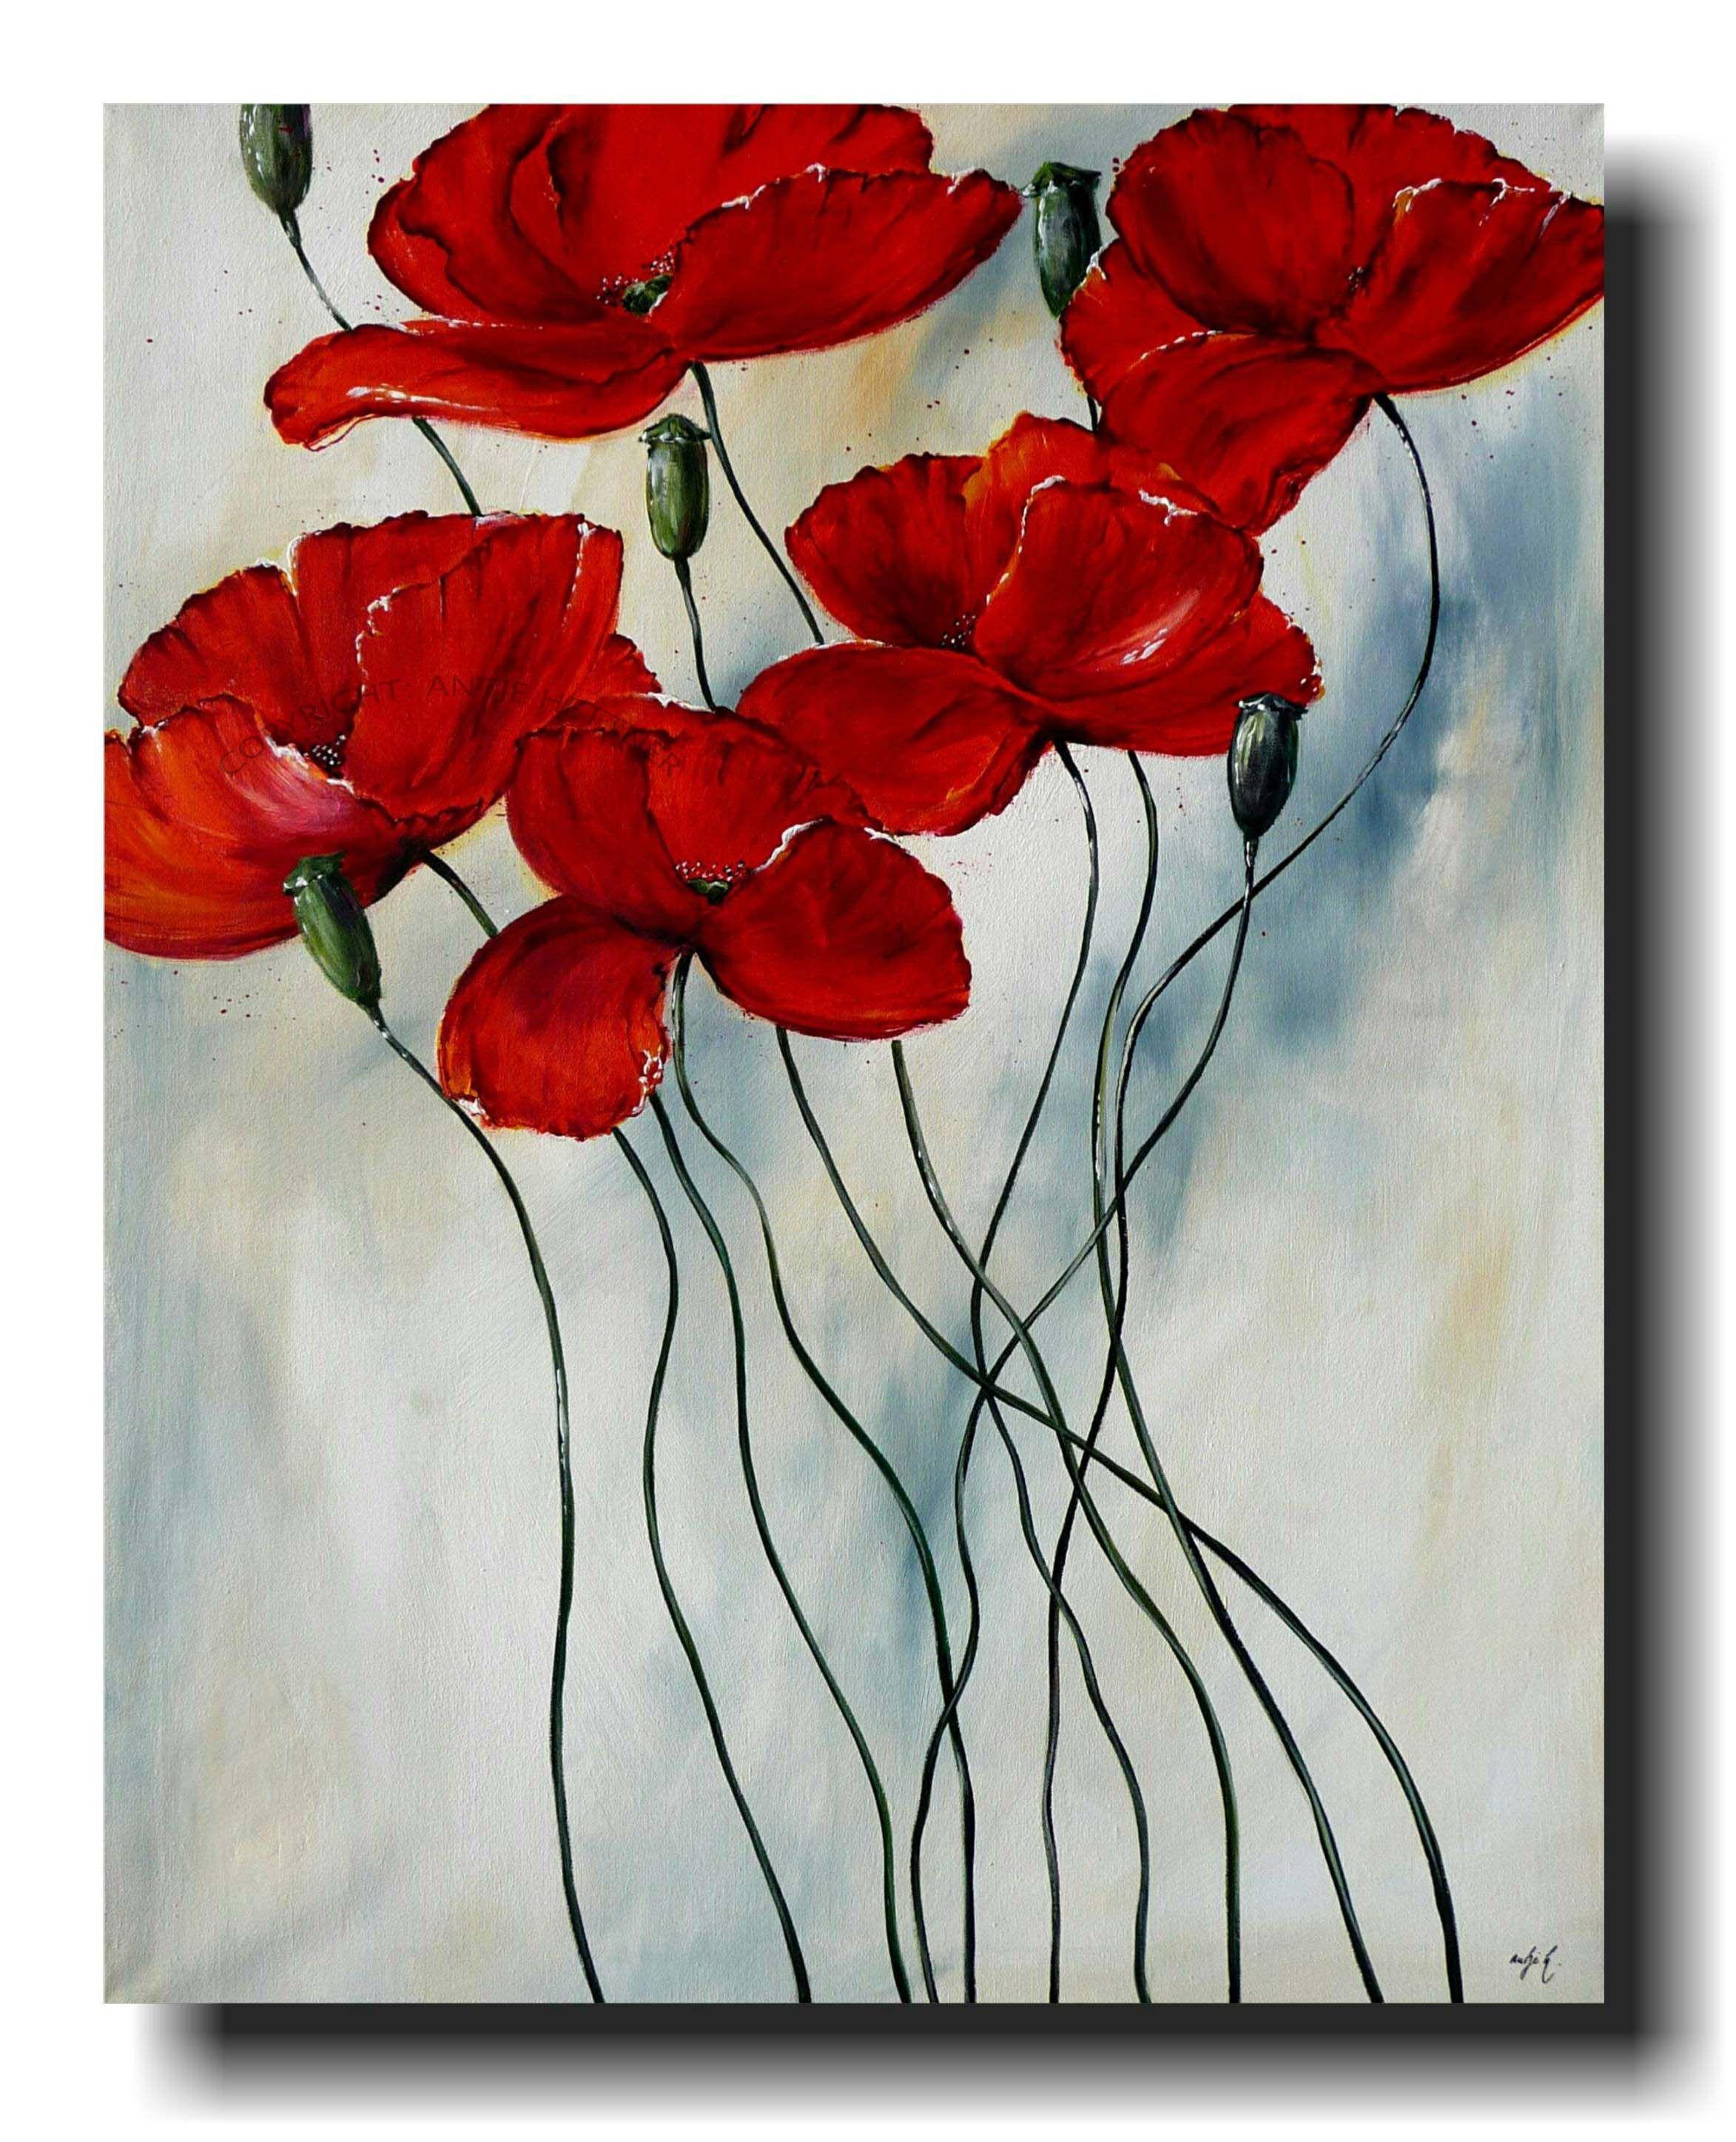 Eisblume Blumenbild Blumen Malerei Wandbild Blute Burgstaller